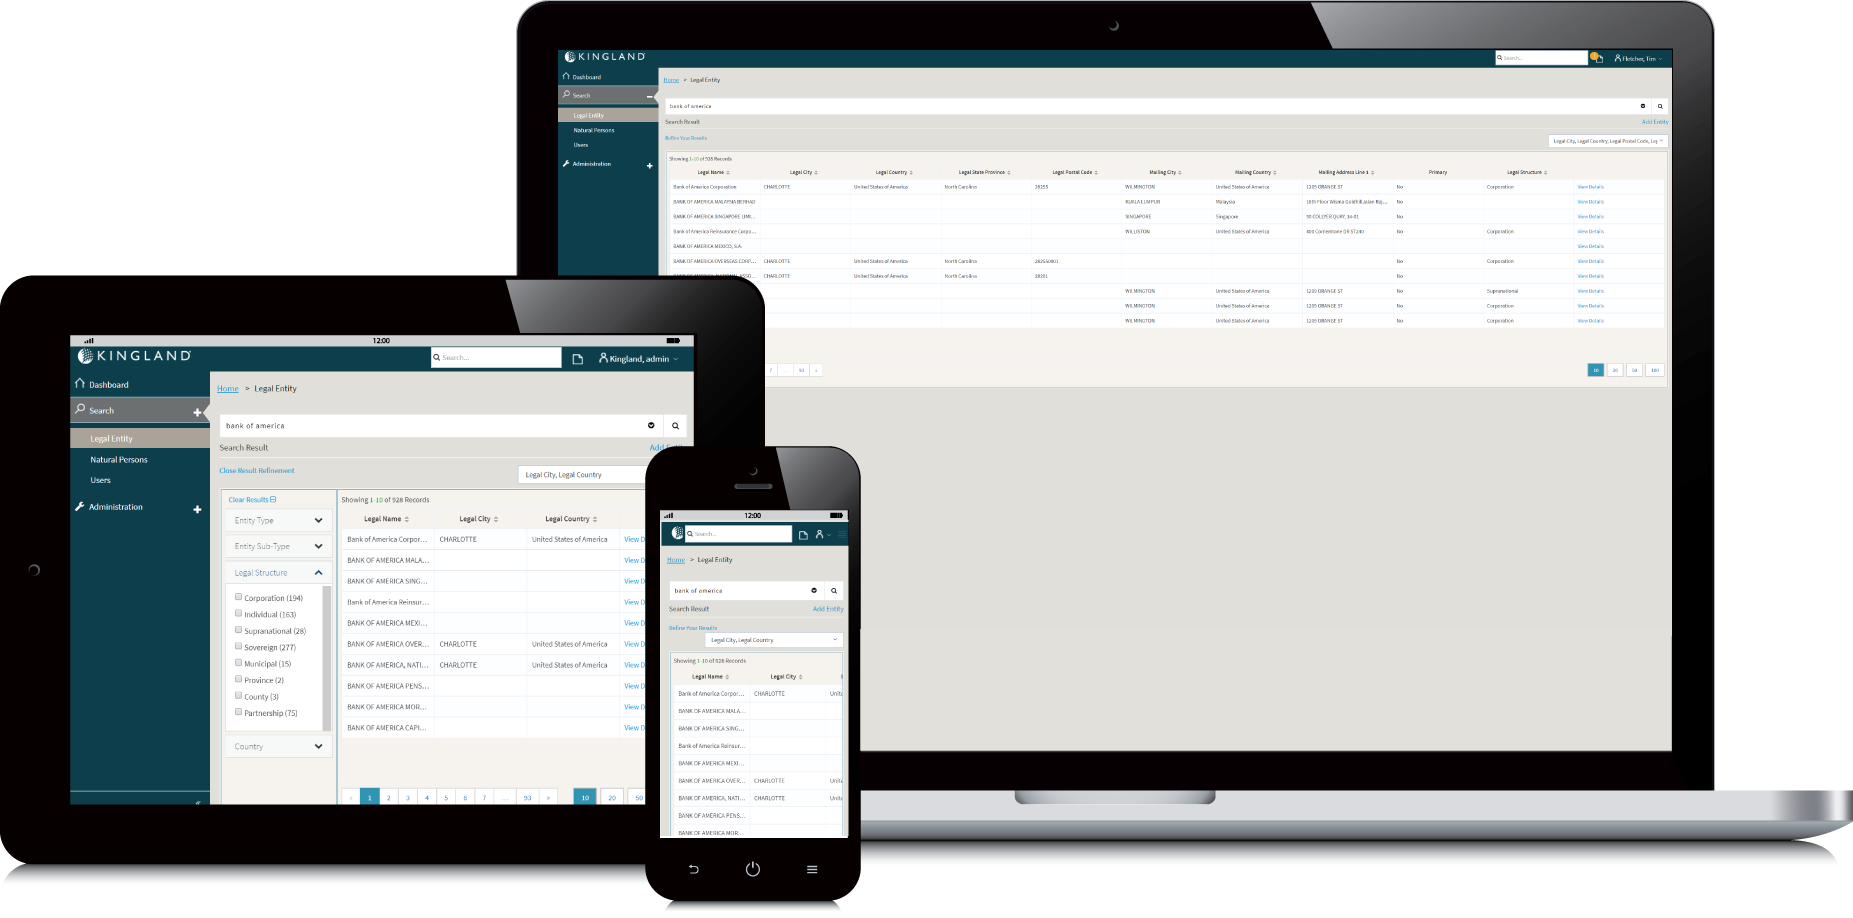 Enterprise Application Foundation Dashboard